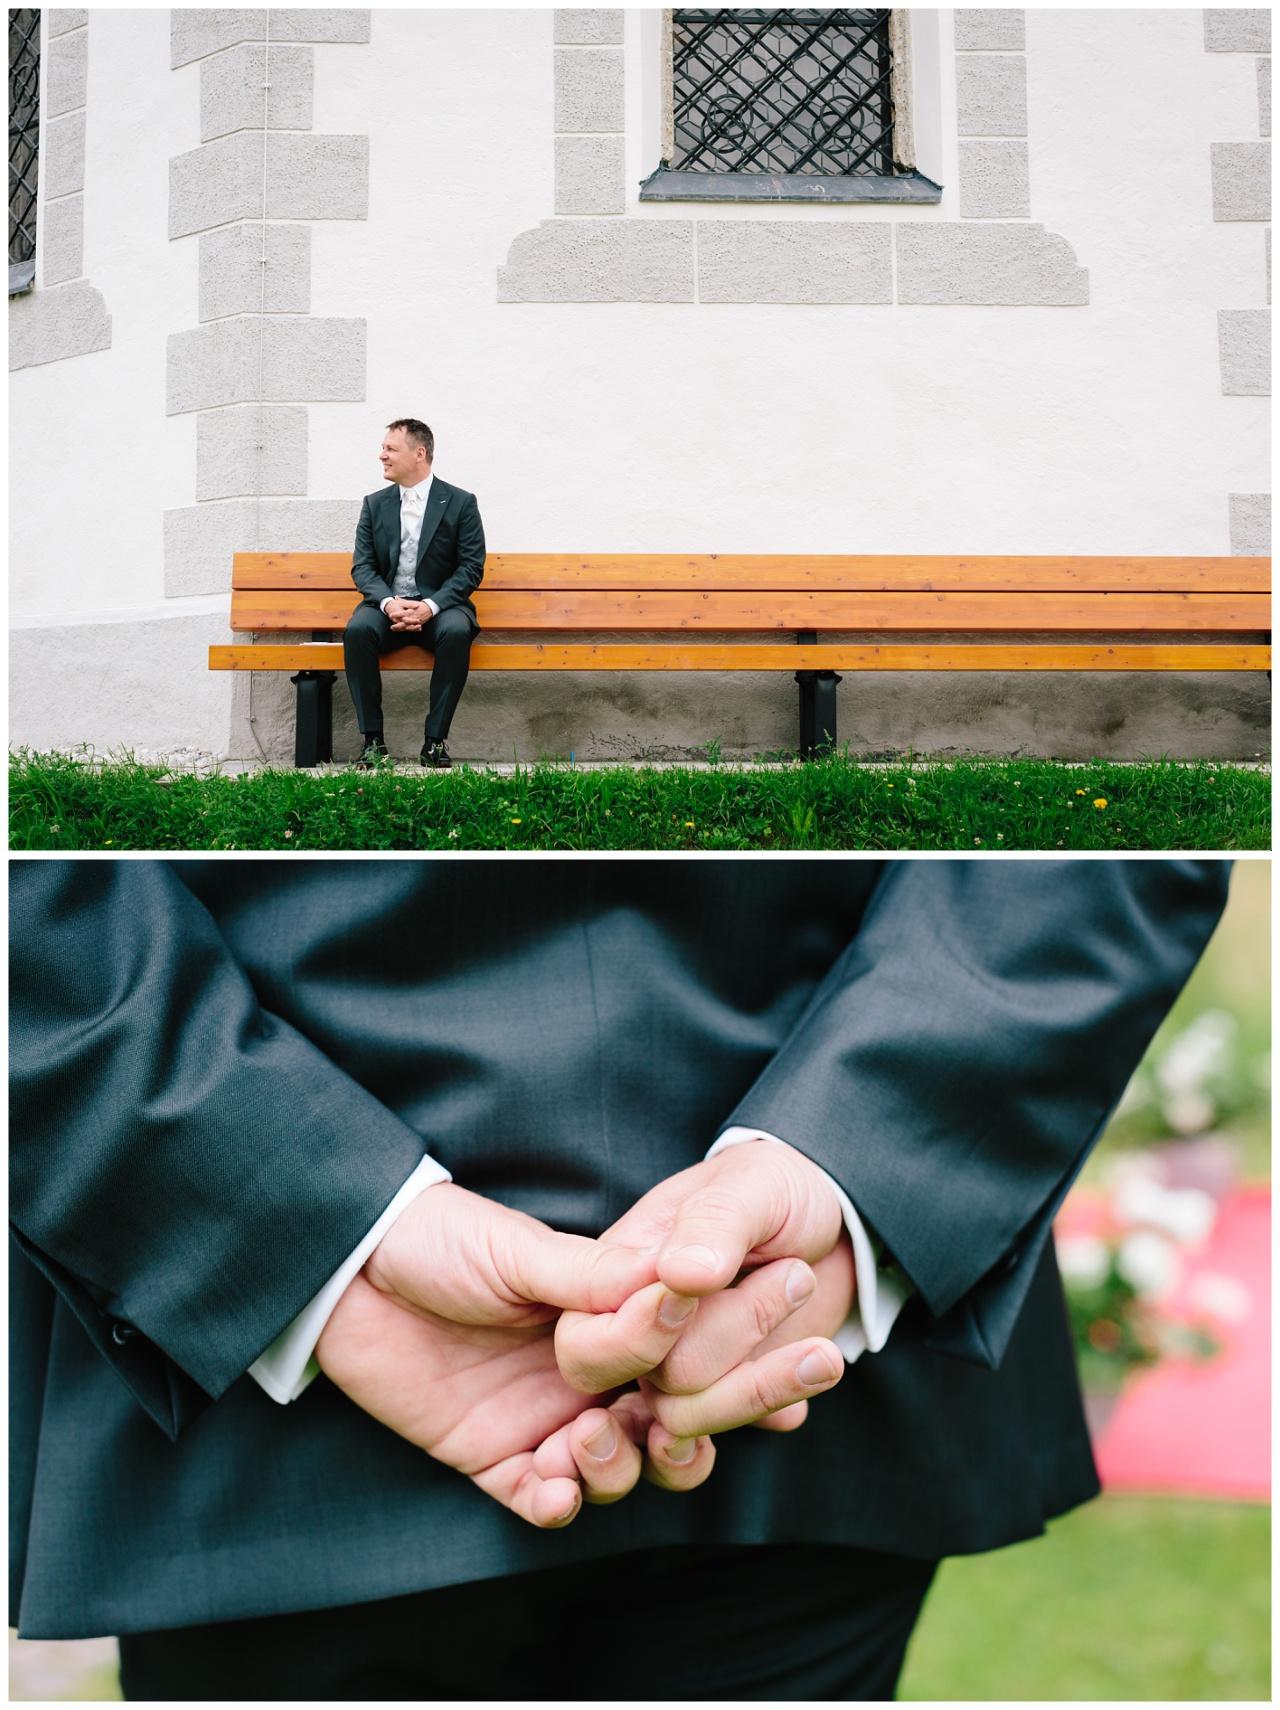 Hochzeitsfotograf Seefeld Triendlsaege 04